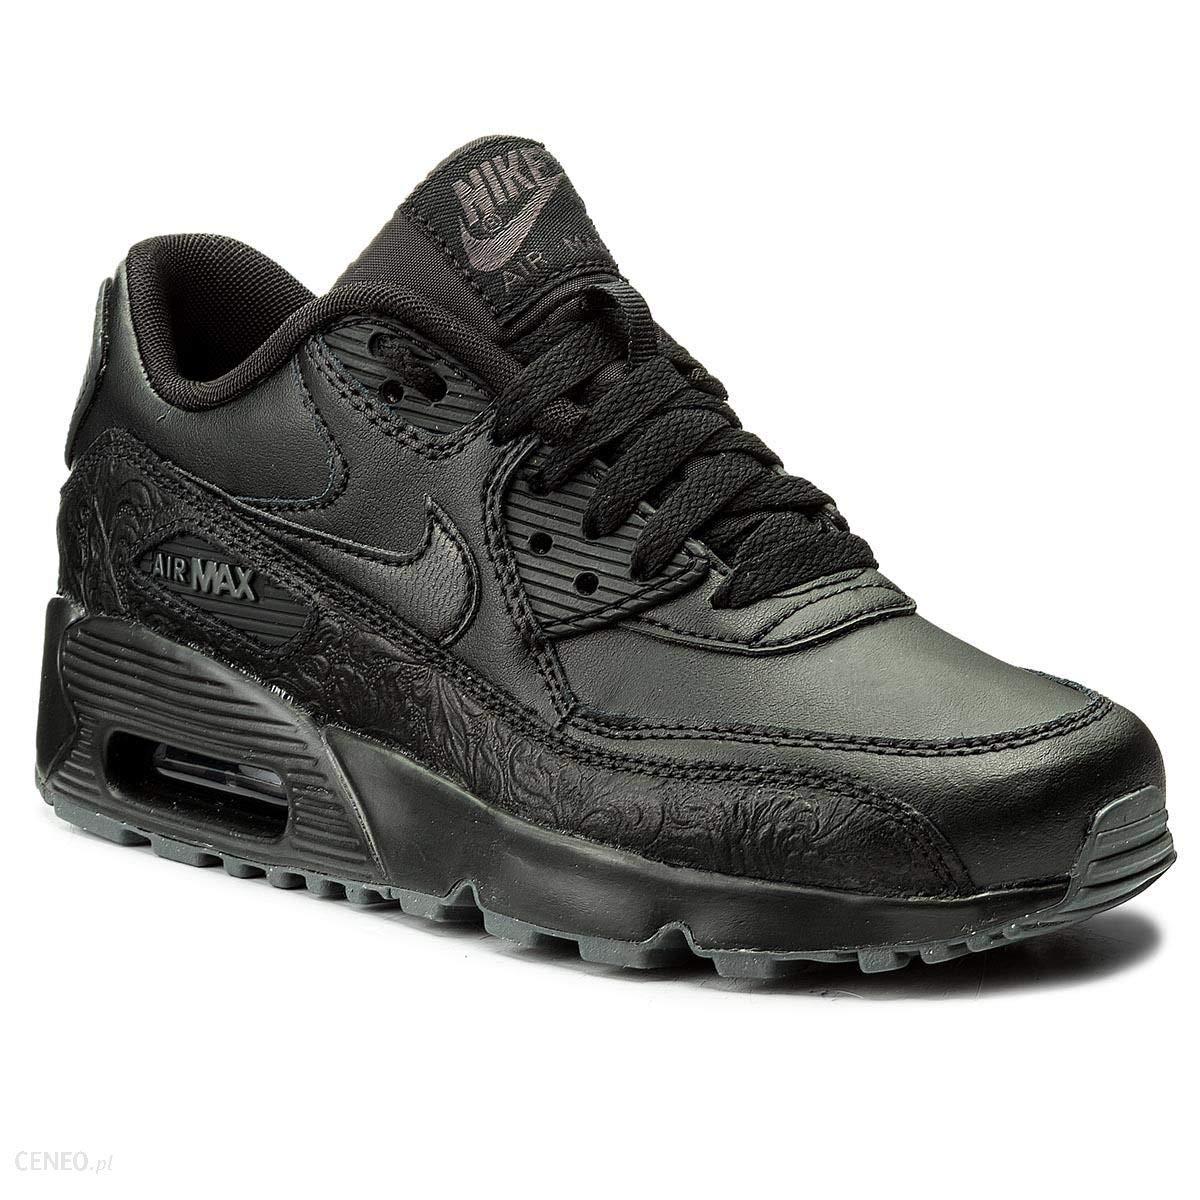 Nike Air Max 90 Leather 897987 001 897987001 Colore: Nero